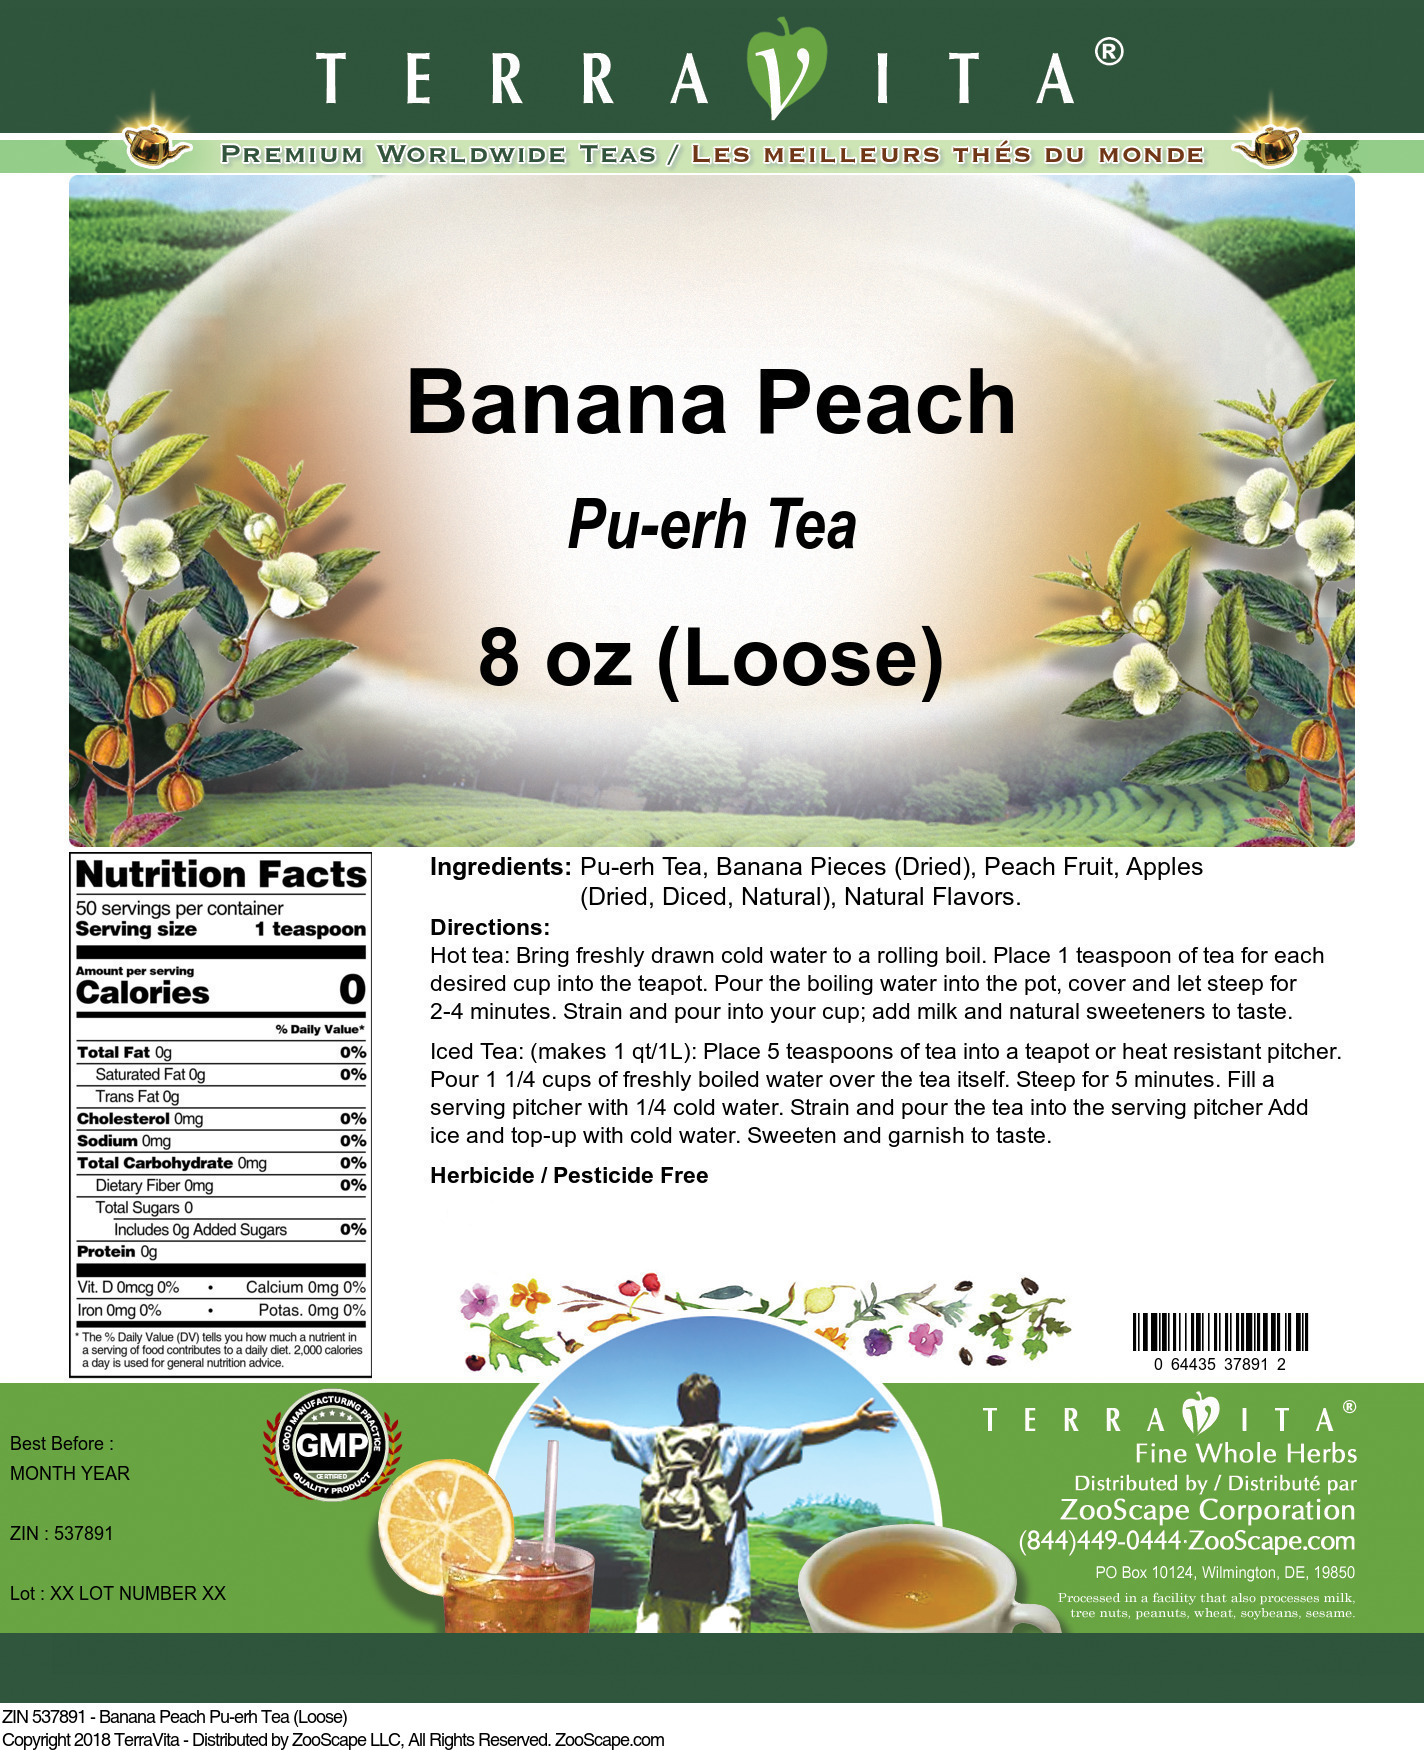 Banana Peach Pu-erh Tea (Loose)